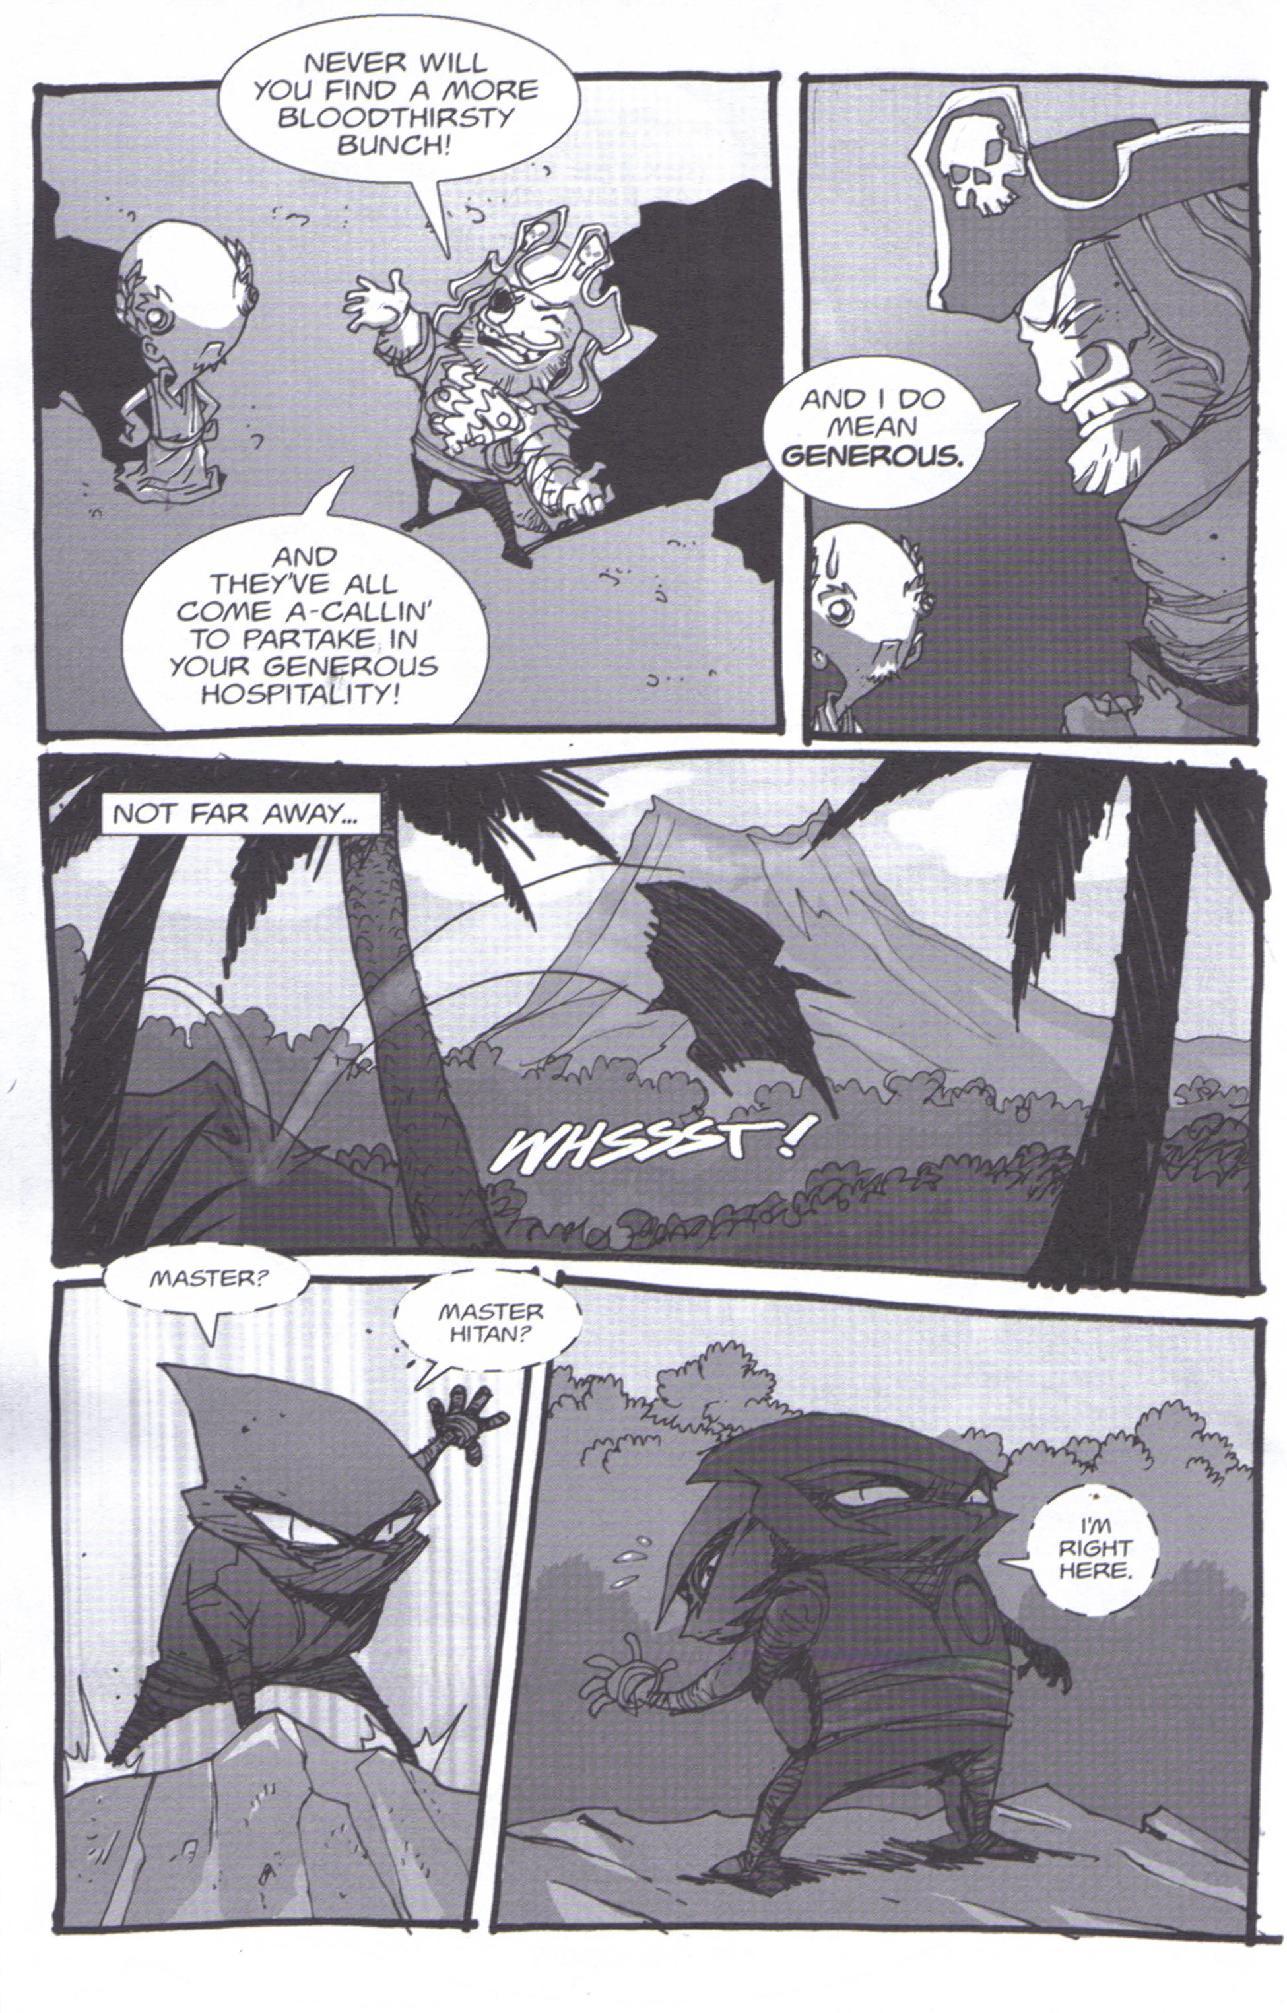 Read online Pirates vs. Ninjas: Global Harming comic -  Issue # Full - 17